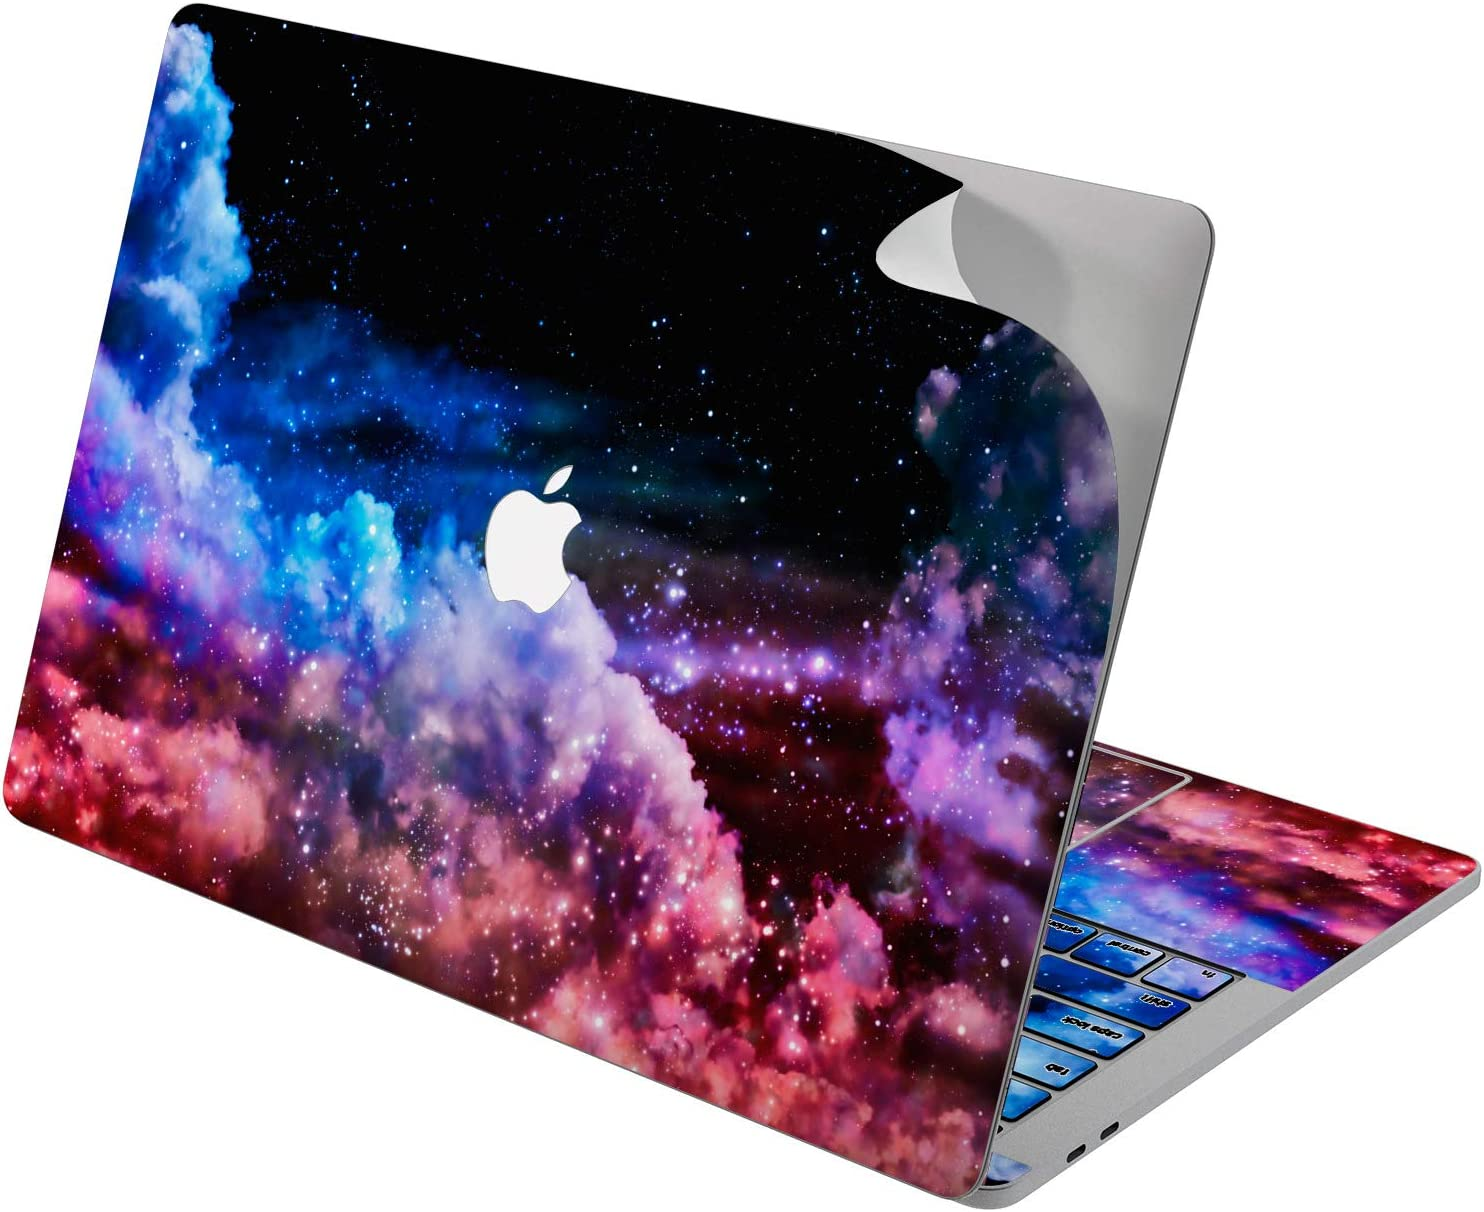 "Cavka Vinyl Decal Skin for Apple MacBook Pro 13"" 2019 15"" 2018 Air 13"" 2020 Retina 2015 Mac 11"" Mac 12"" Stars Sticker Colorful Clouds Sky Laptop Protective Print Pattern Galaxy Design Beautiful Cover"